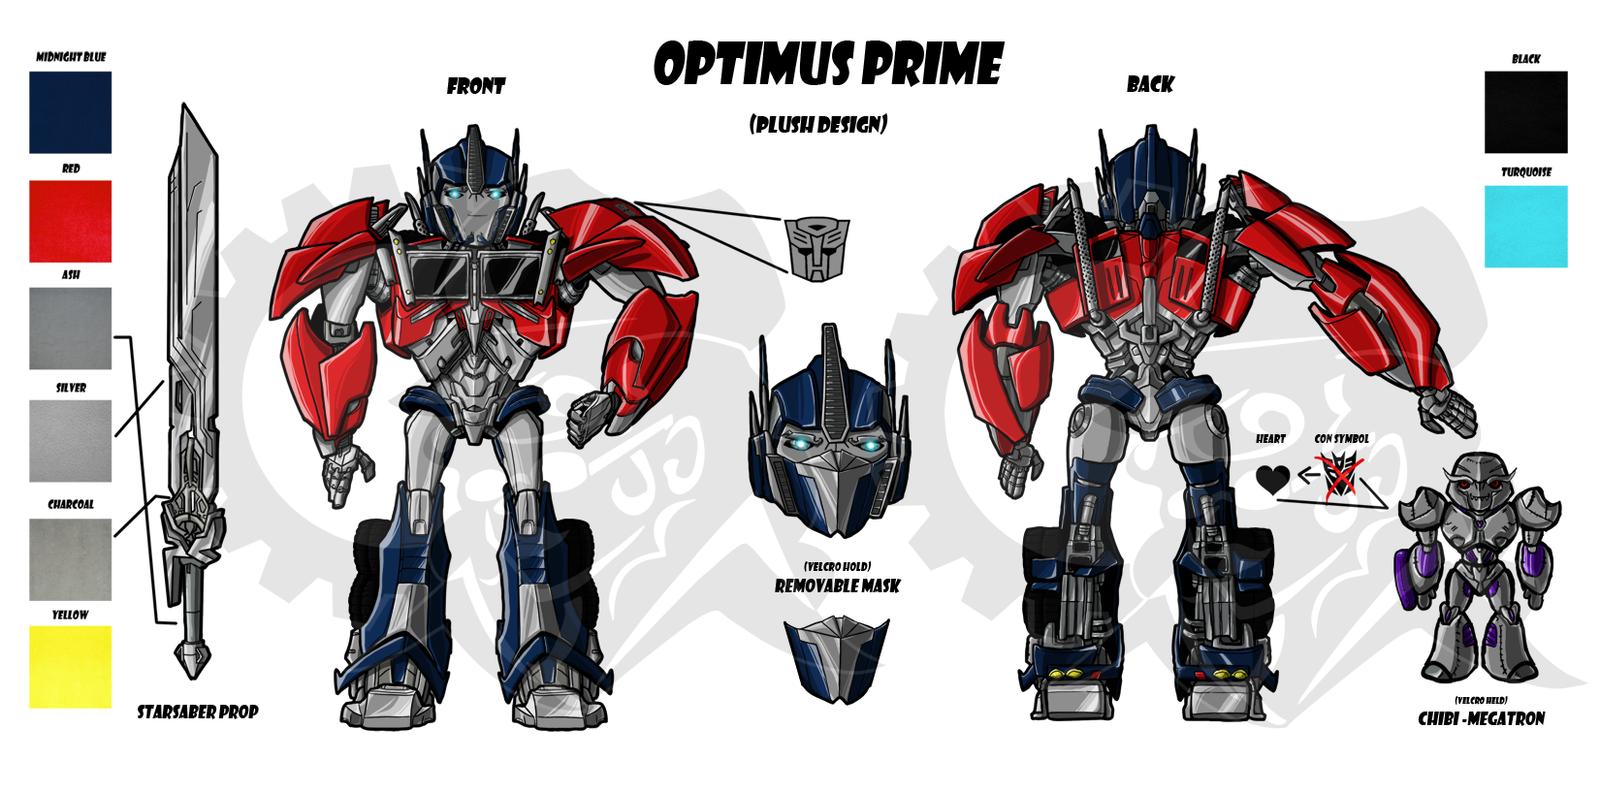 Optimus prime plush design sheet by laserbot on deviantart - Optimus prime dessin ...